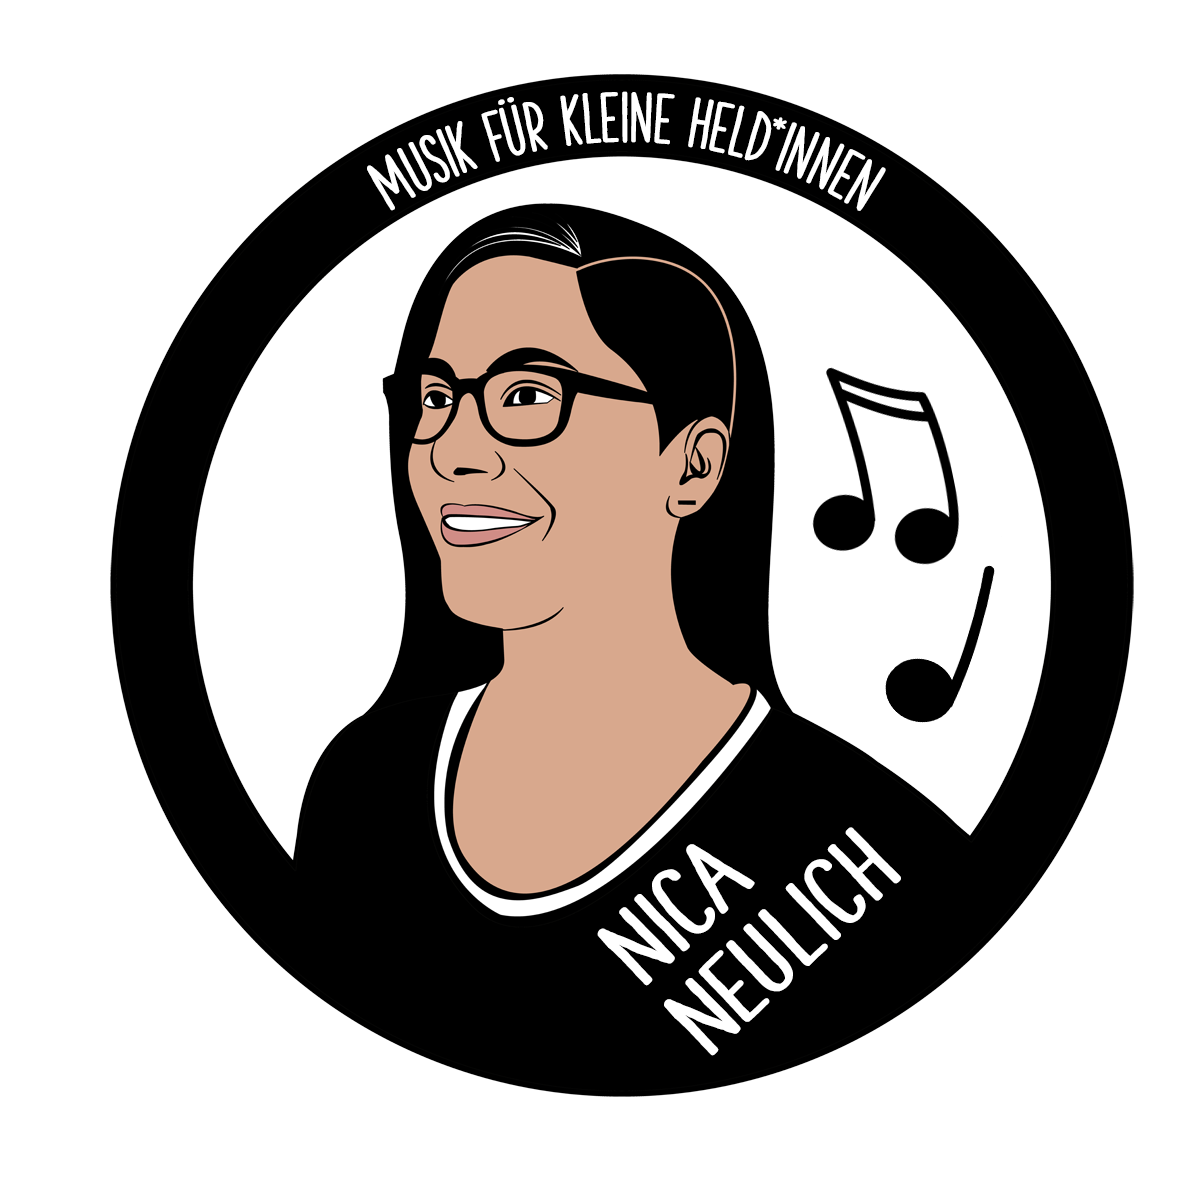 Nica Neulich